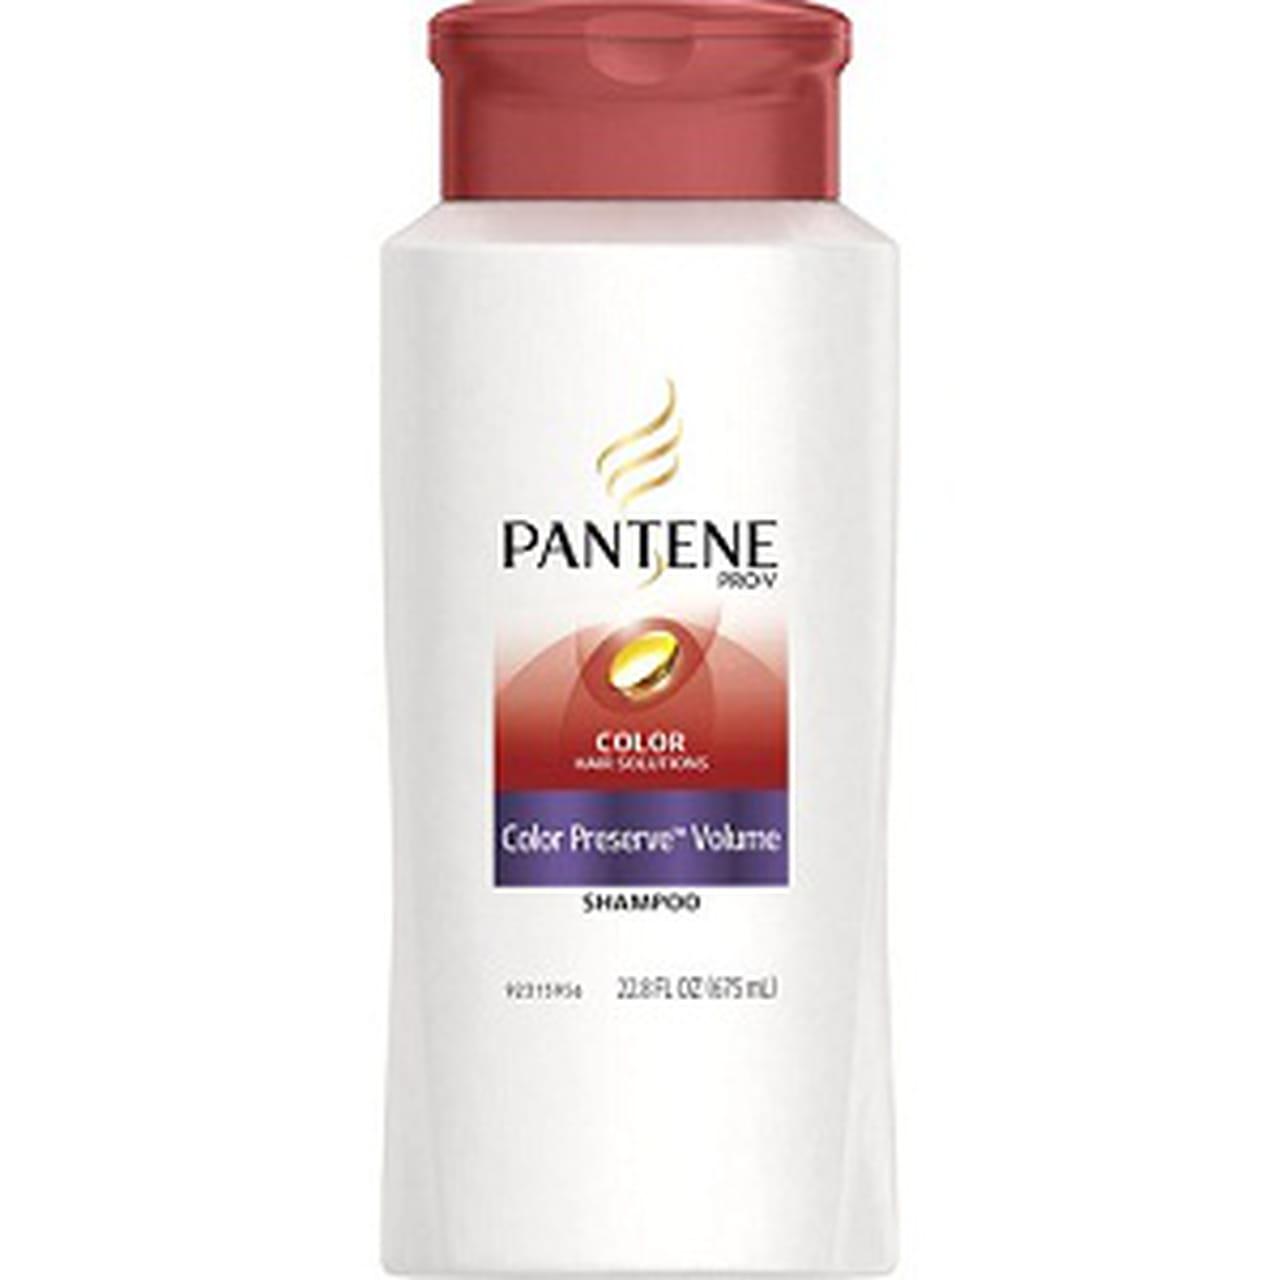 168f8b3e5 4- Pantene Pro-V Color Hair Solutions Color